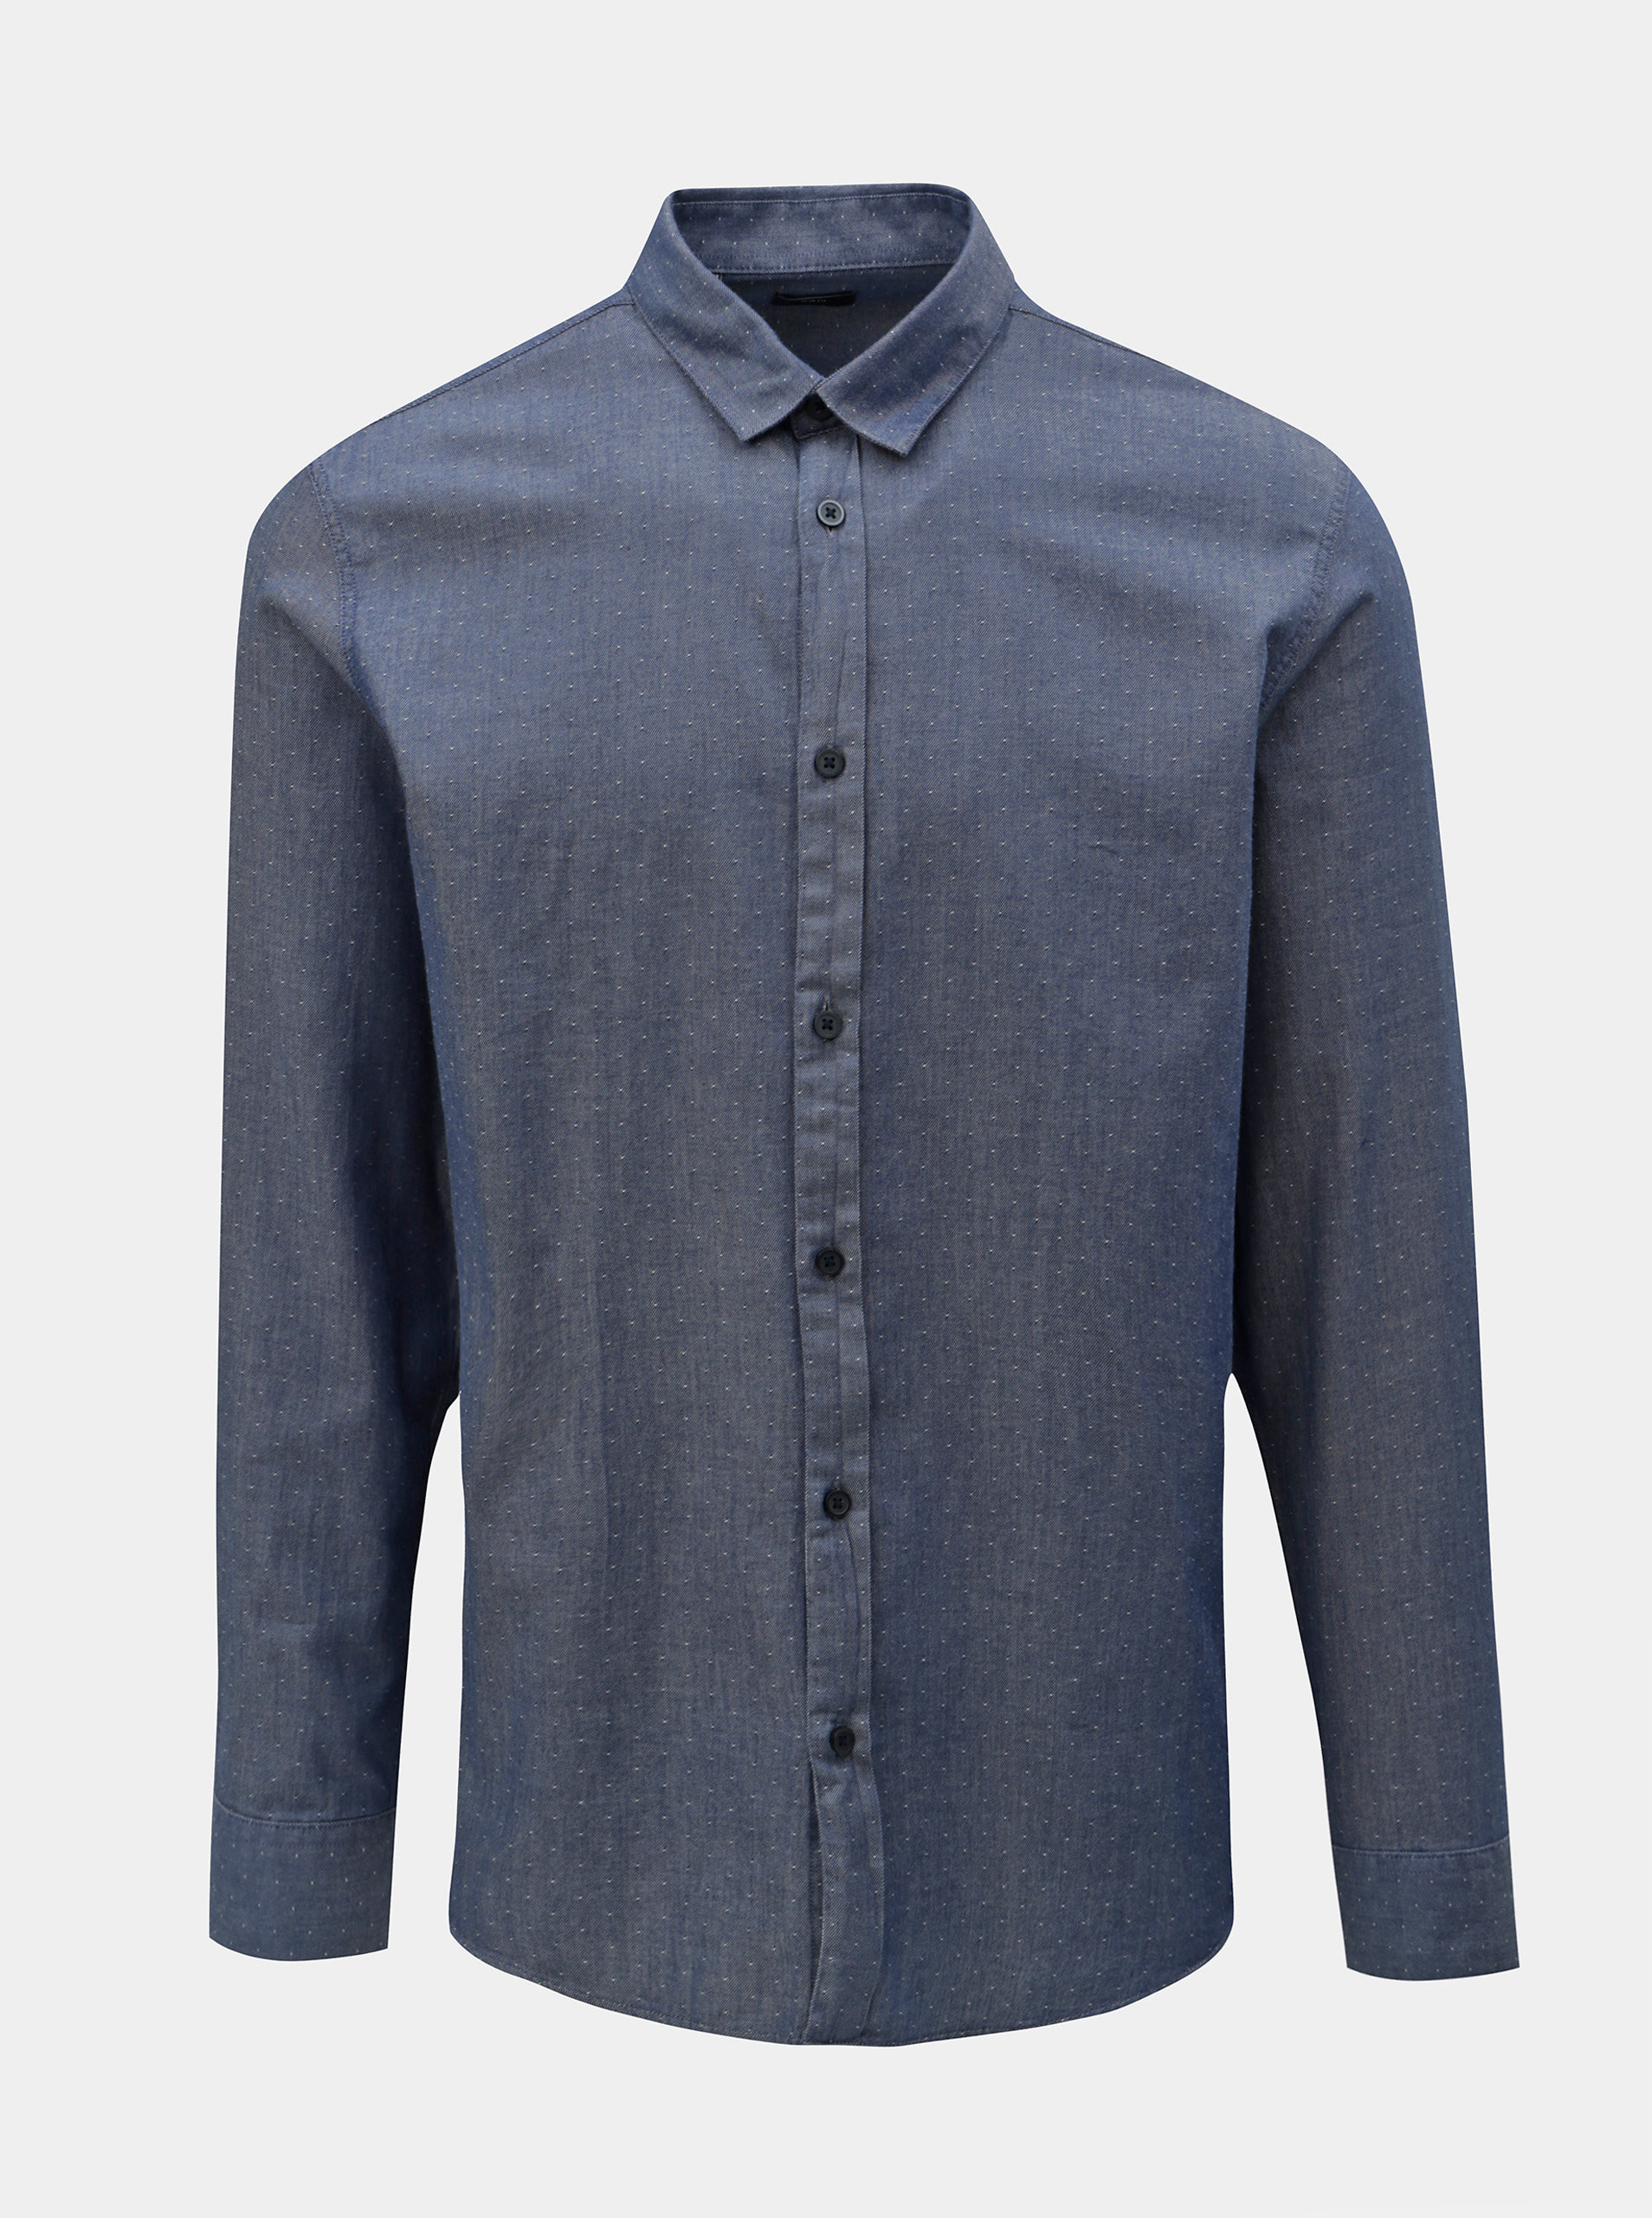 Modrá puntíkovaná slim fit košile Selected Homme Kris ... deb45b033a